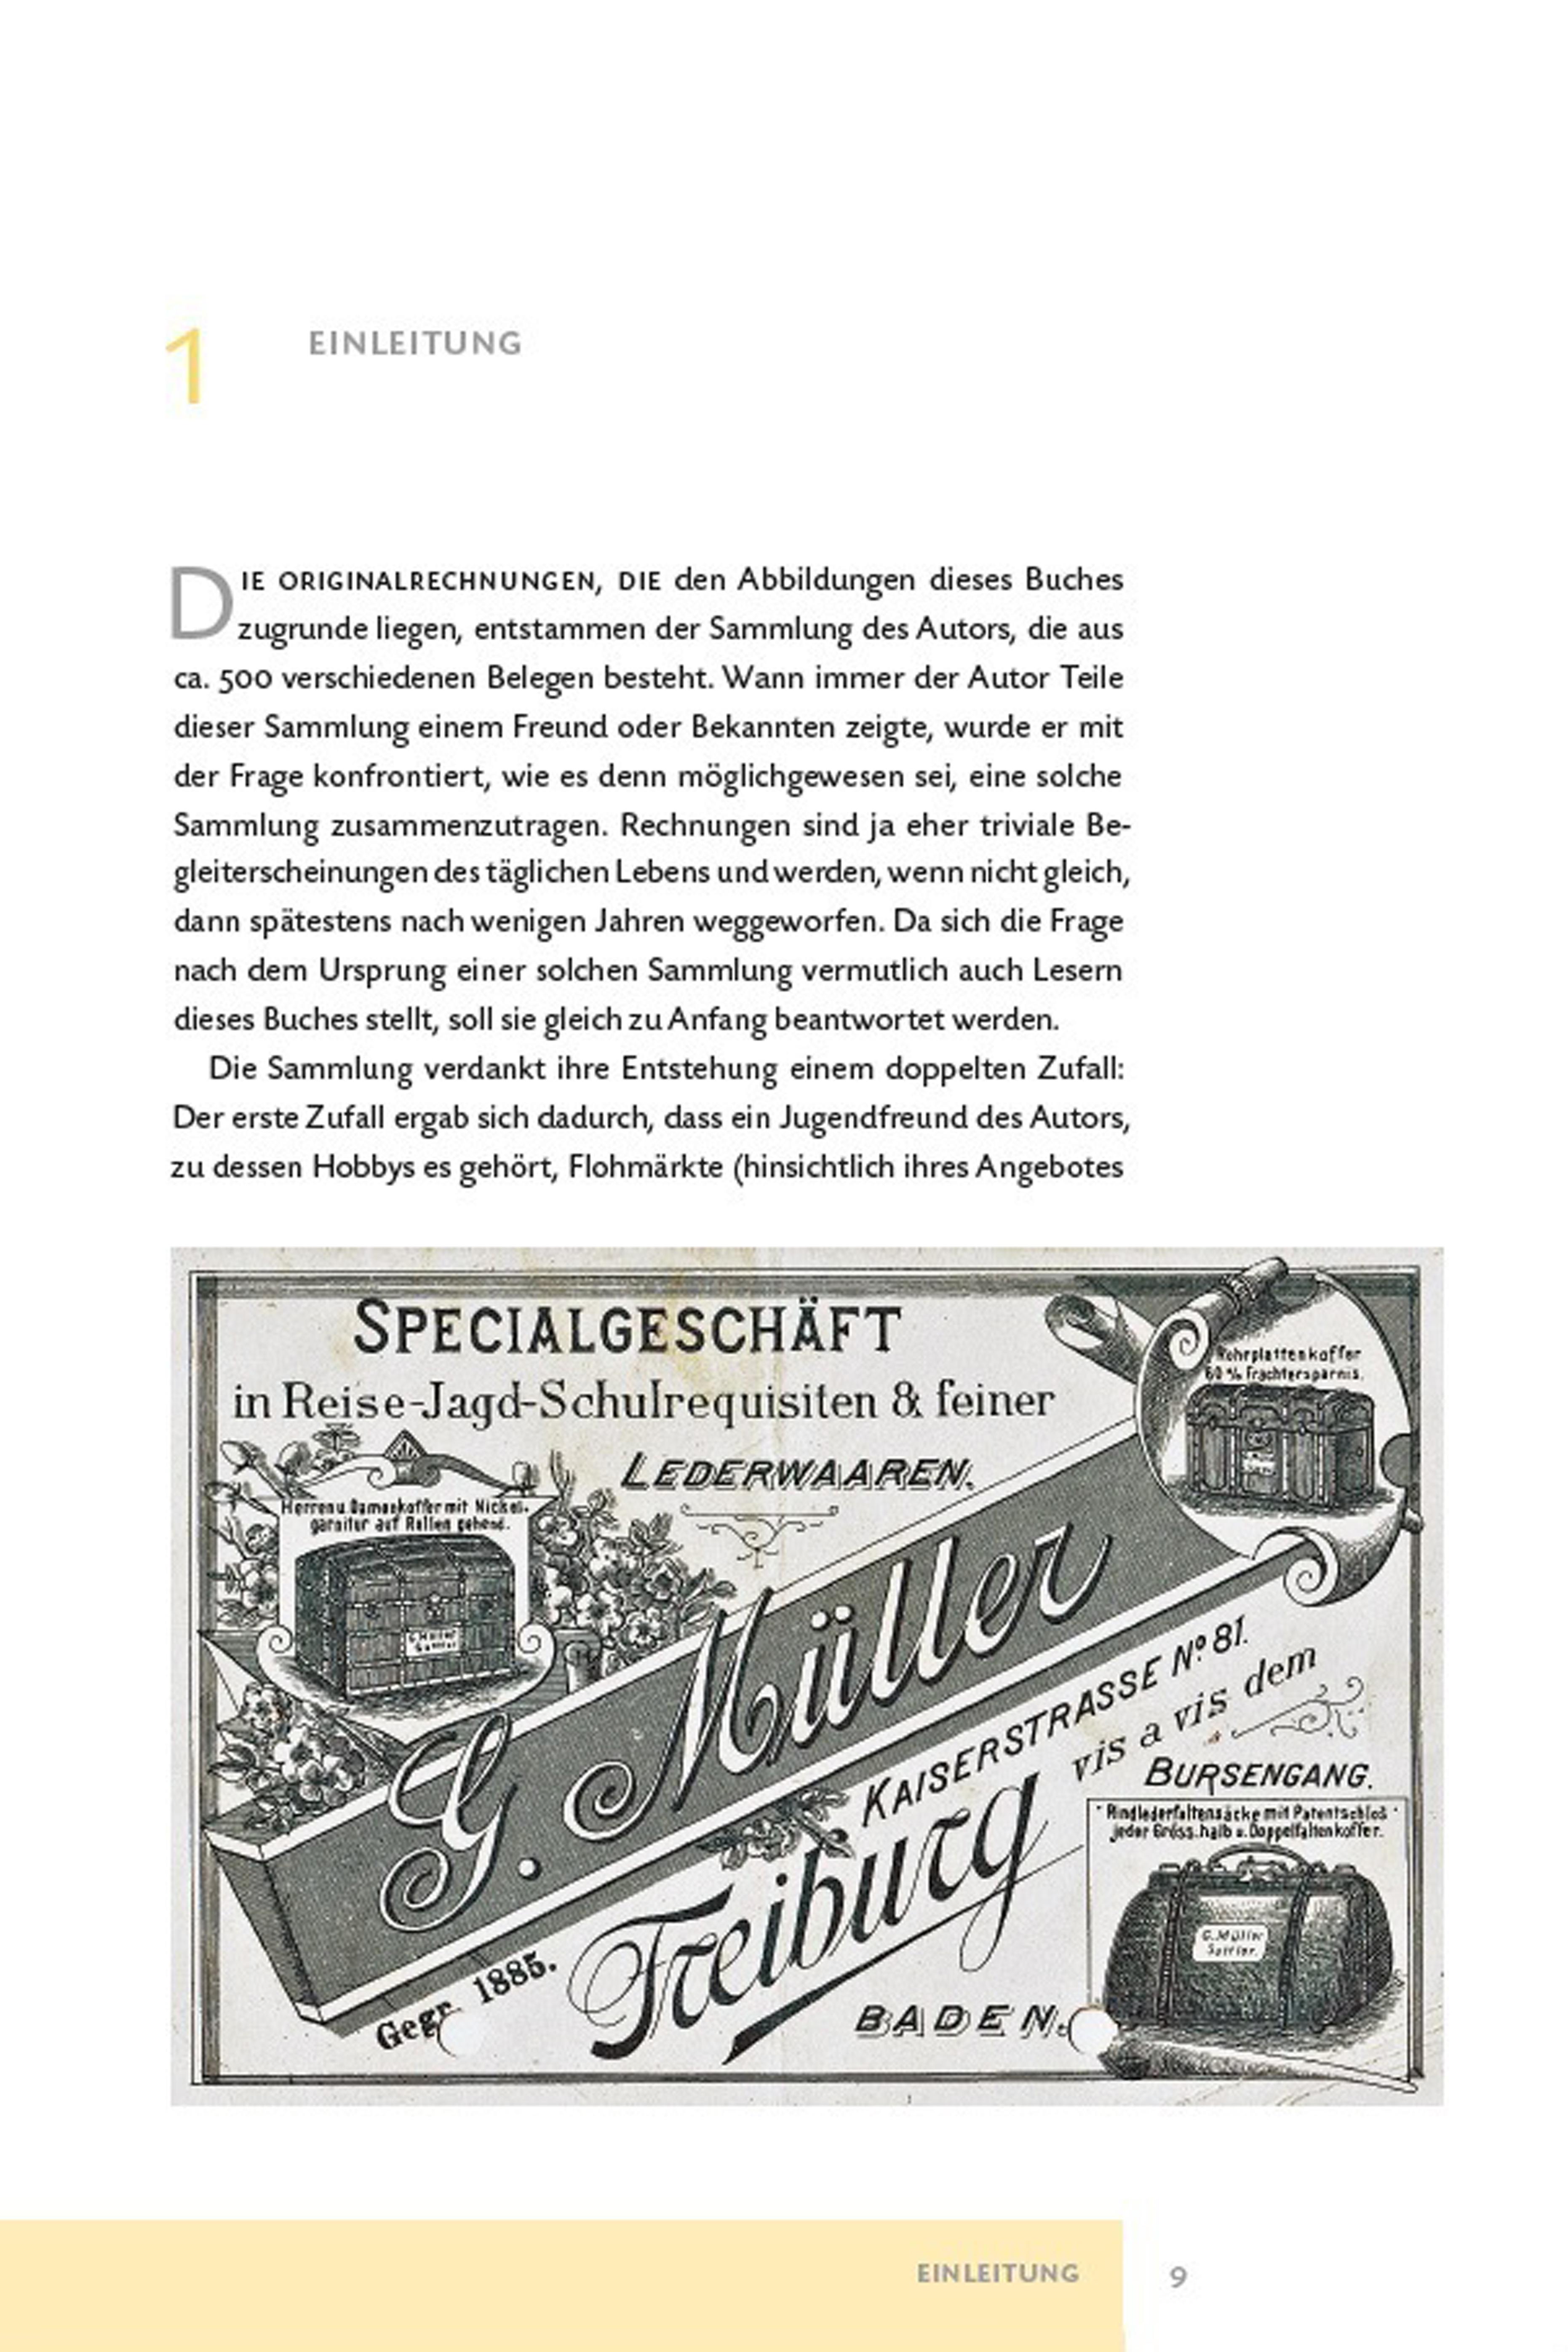 Freiburger Warenwelt um 1900 03